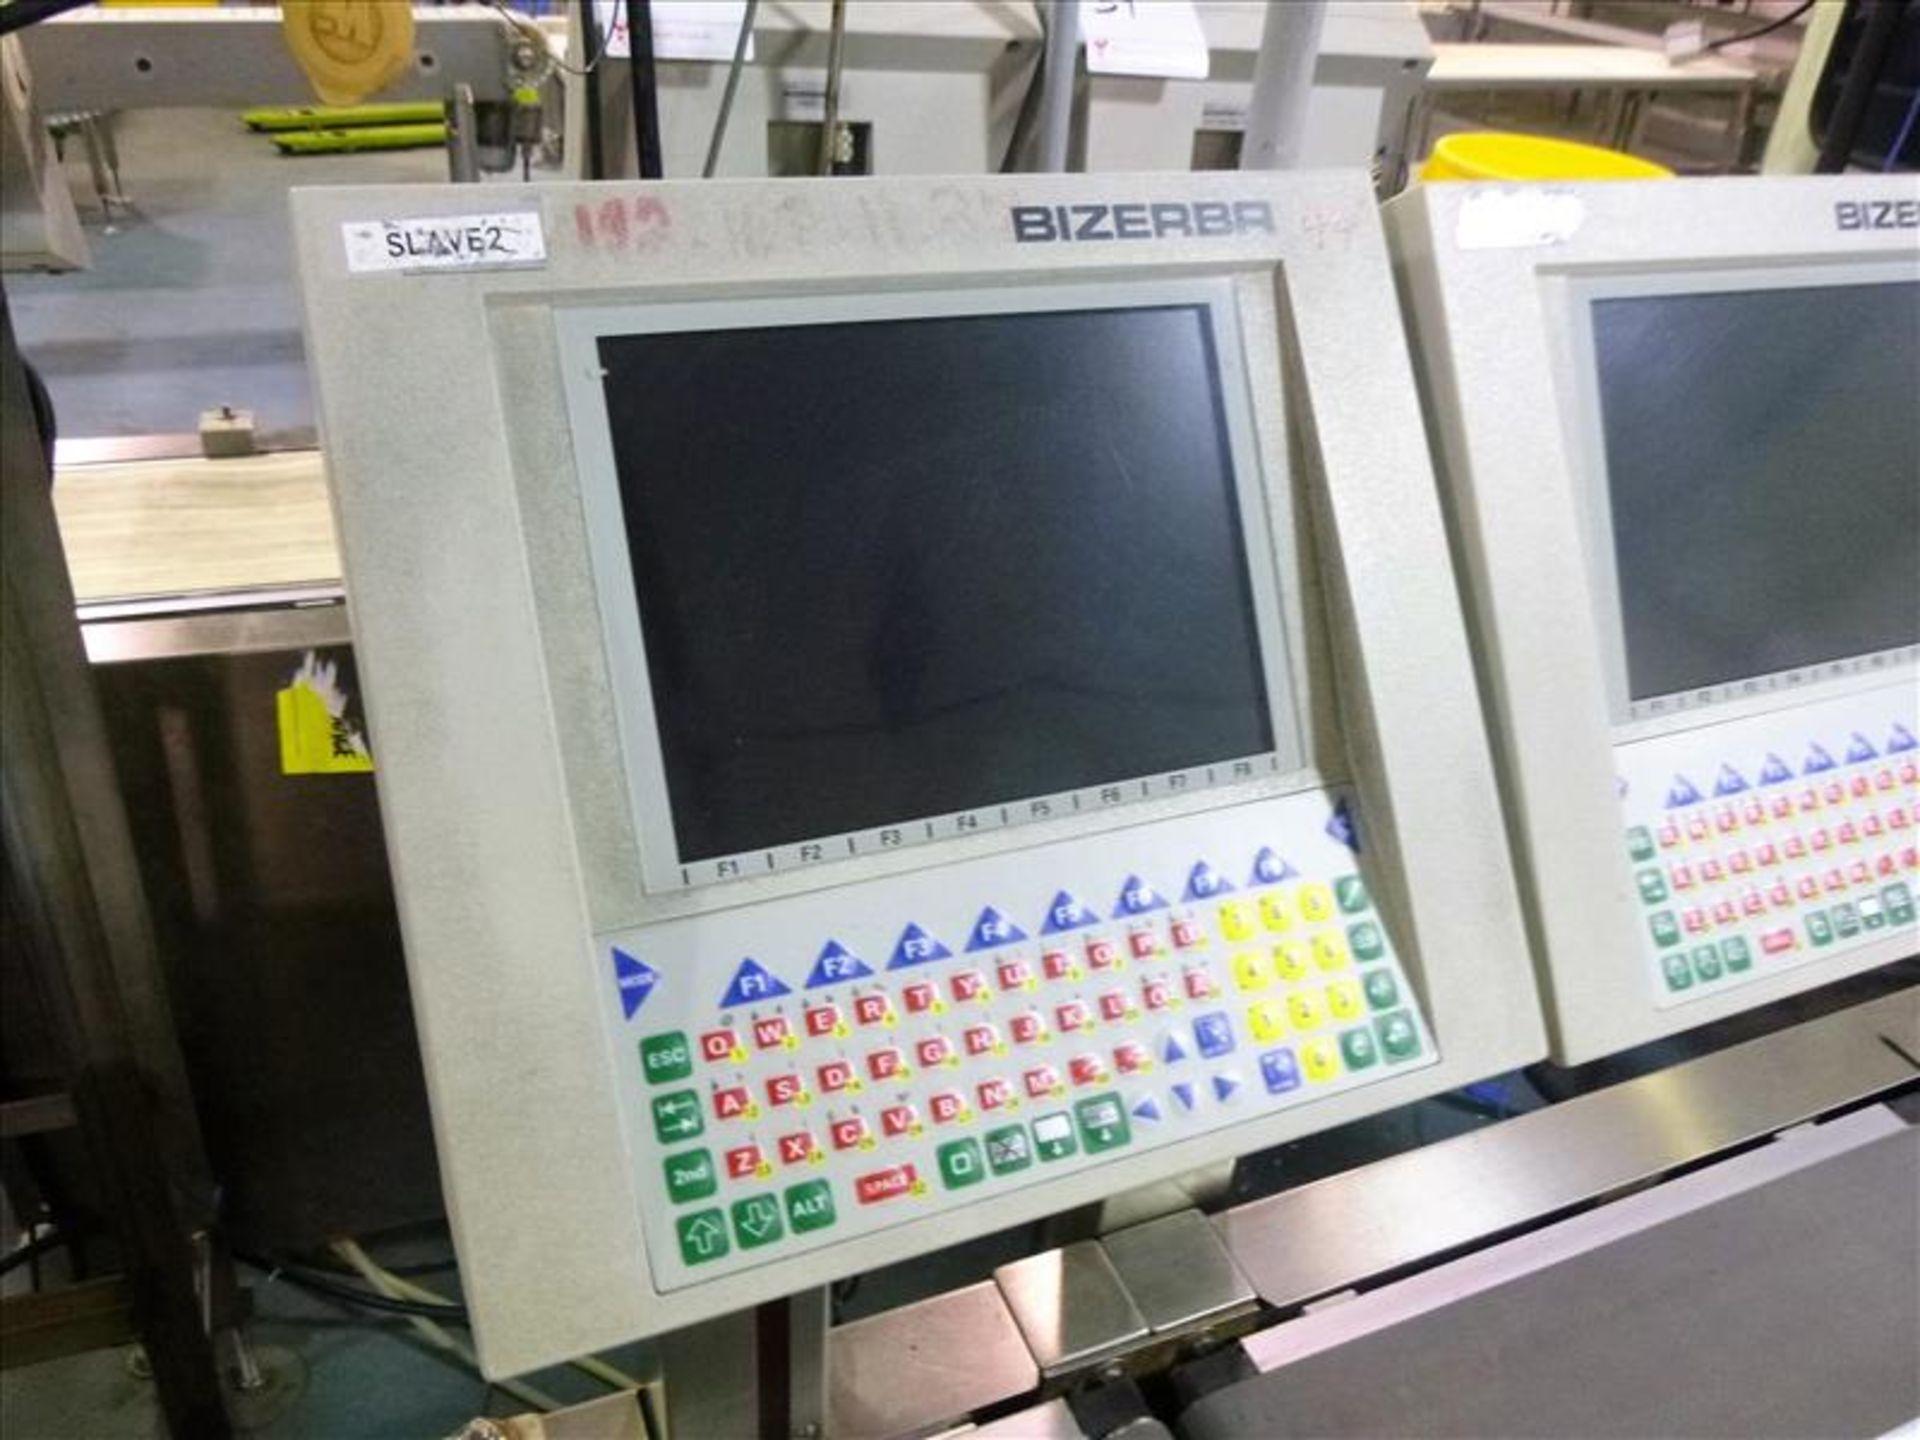 Lot 44 - Bizerba in-line check-weigher system (SLAVE1) w/ (no label printer) Bizerba AB controller, ser.